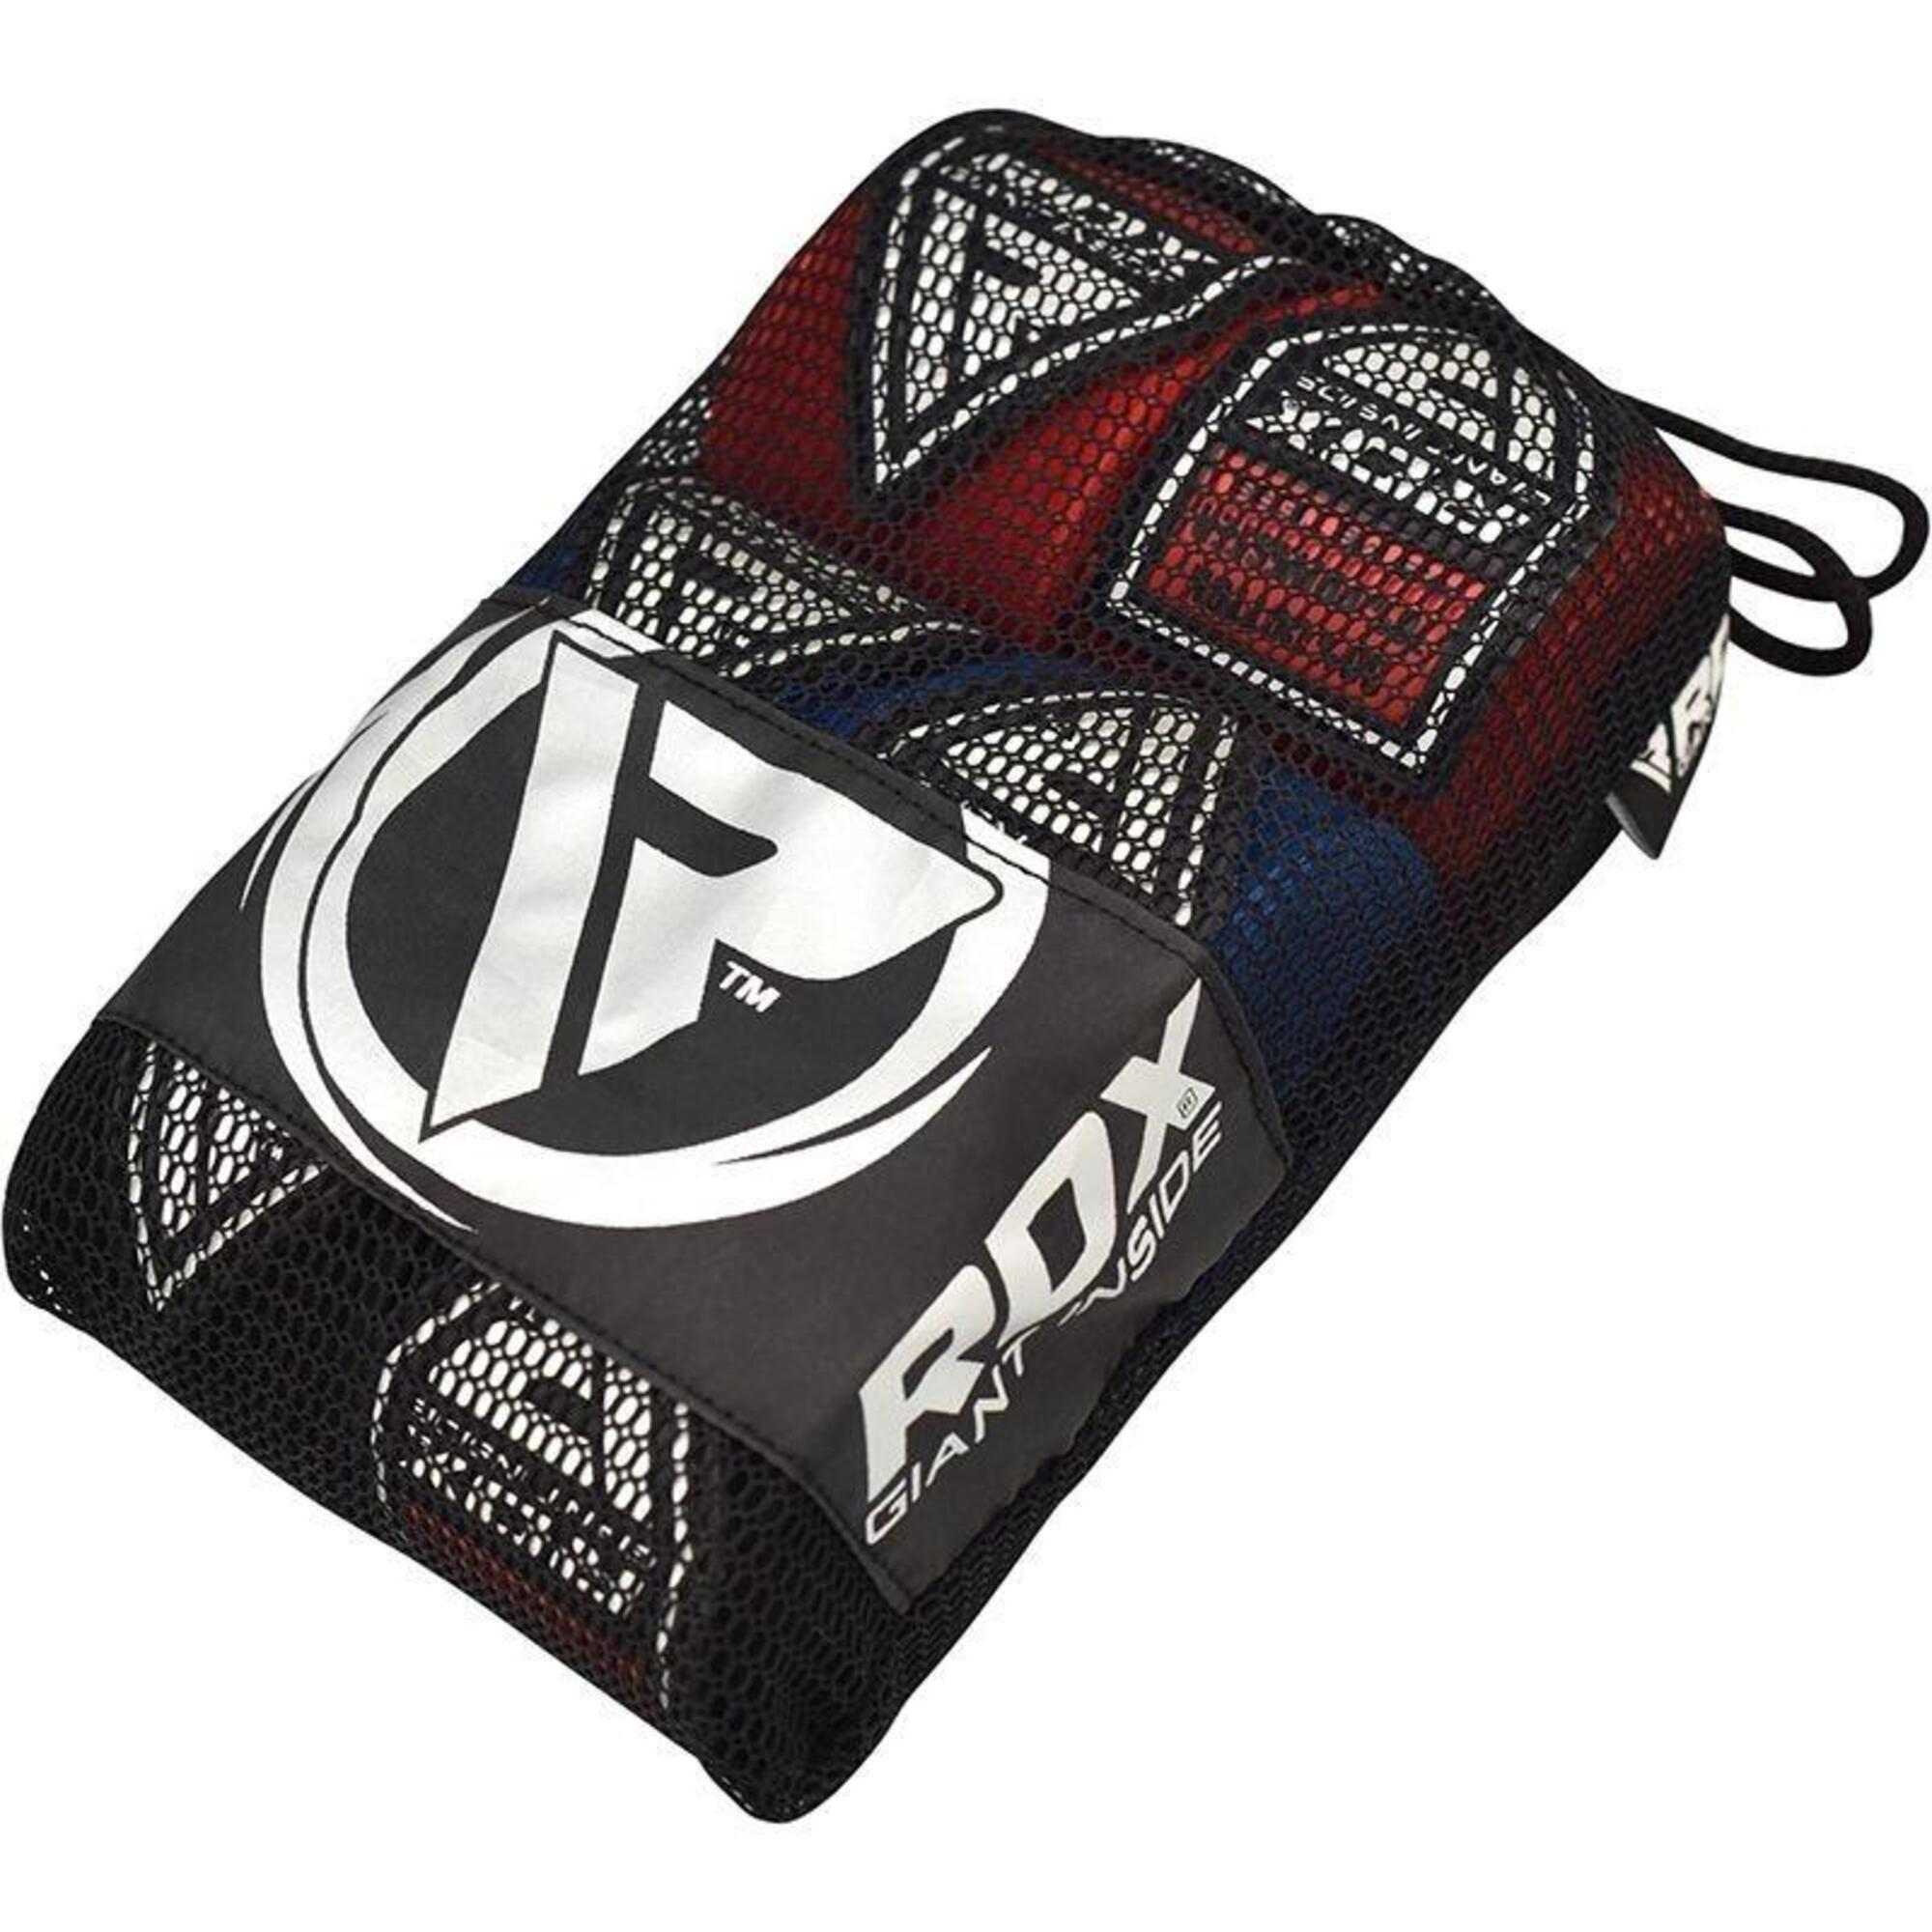 RDX Sports HW Professionele boksbandages - Set Zwart, Rood en Blauw